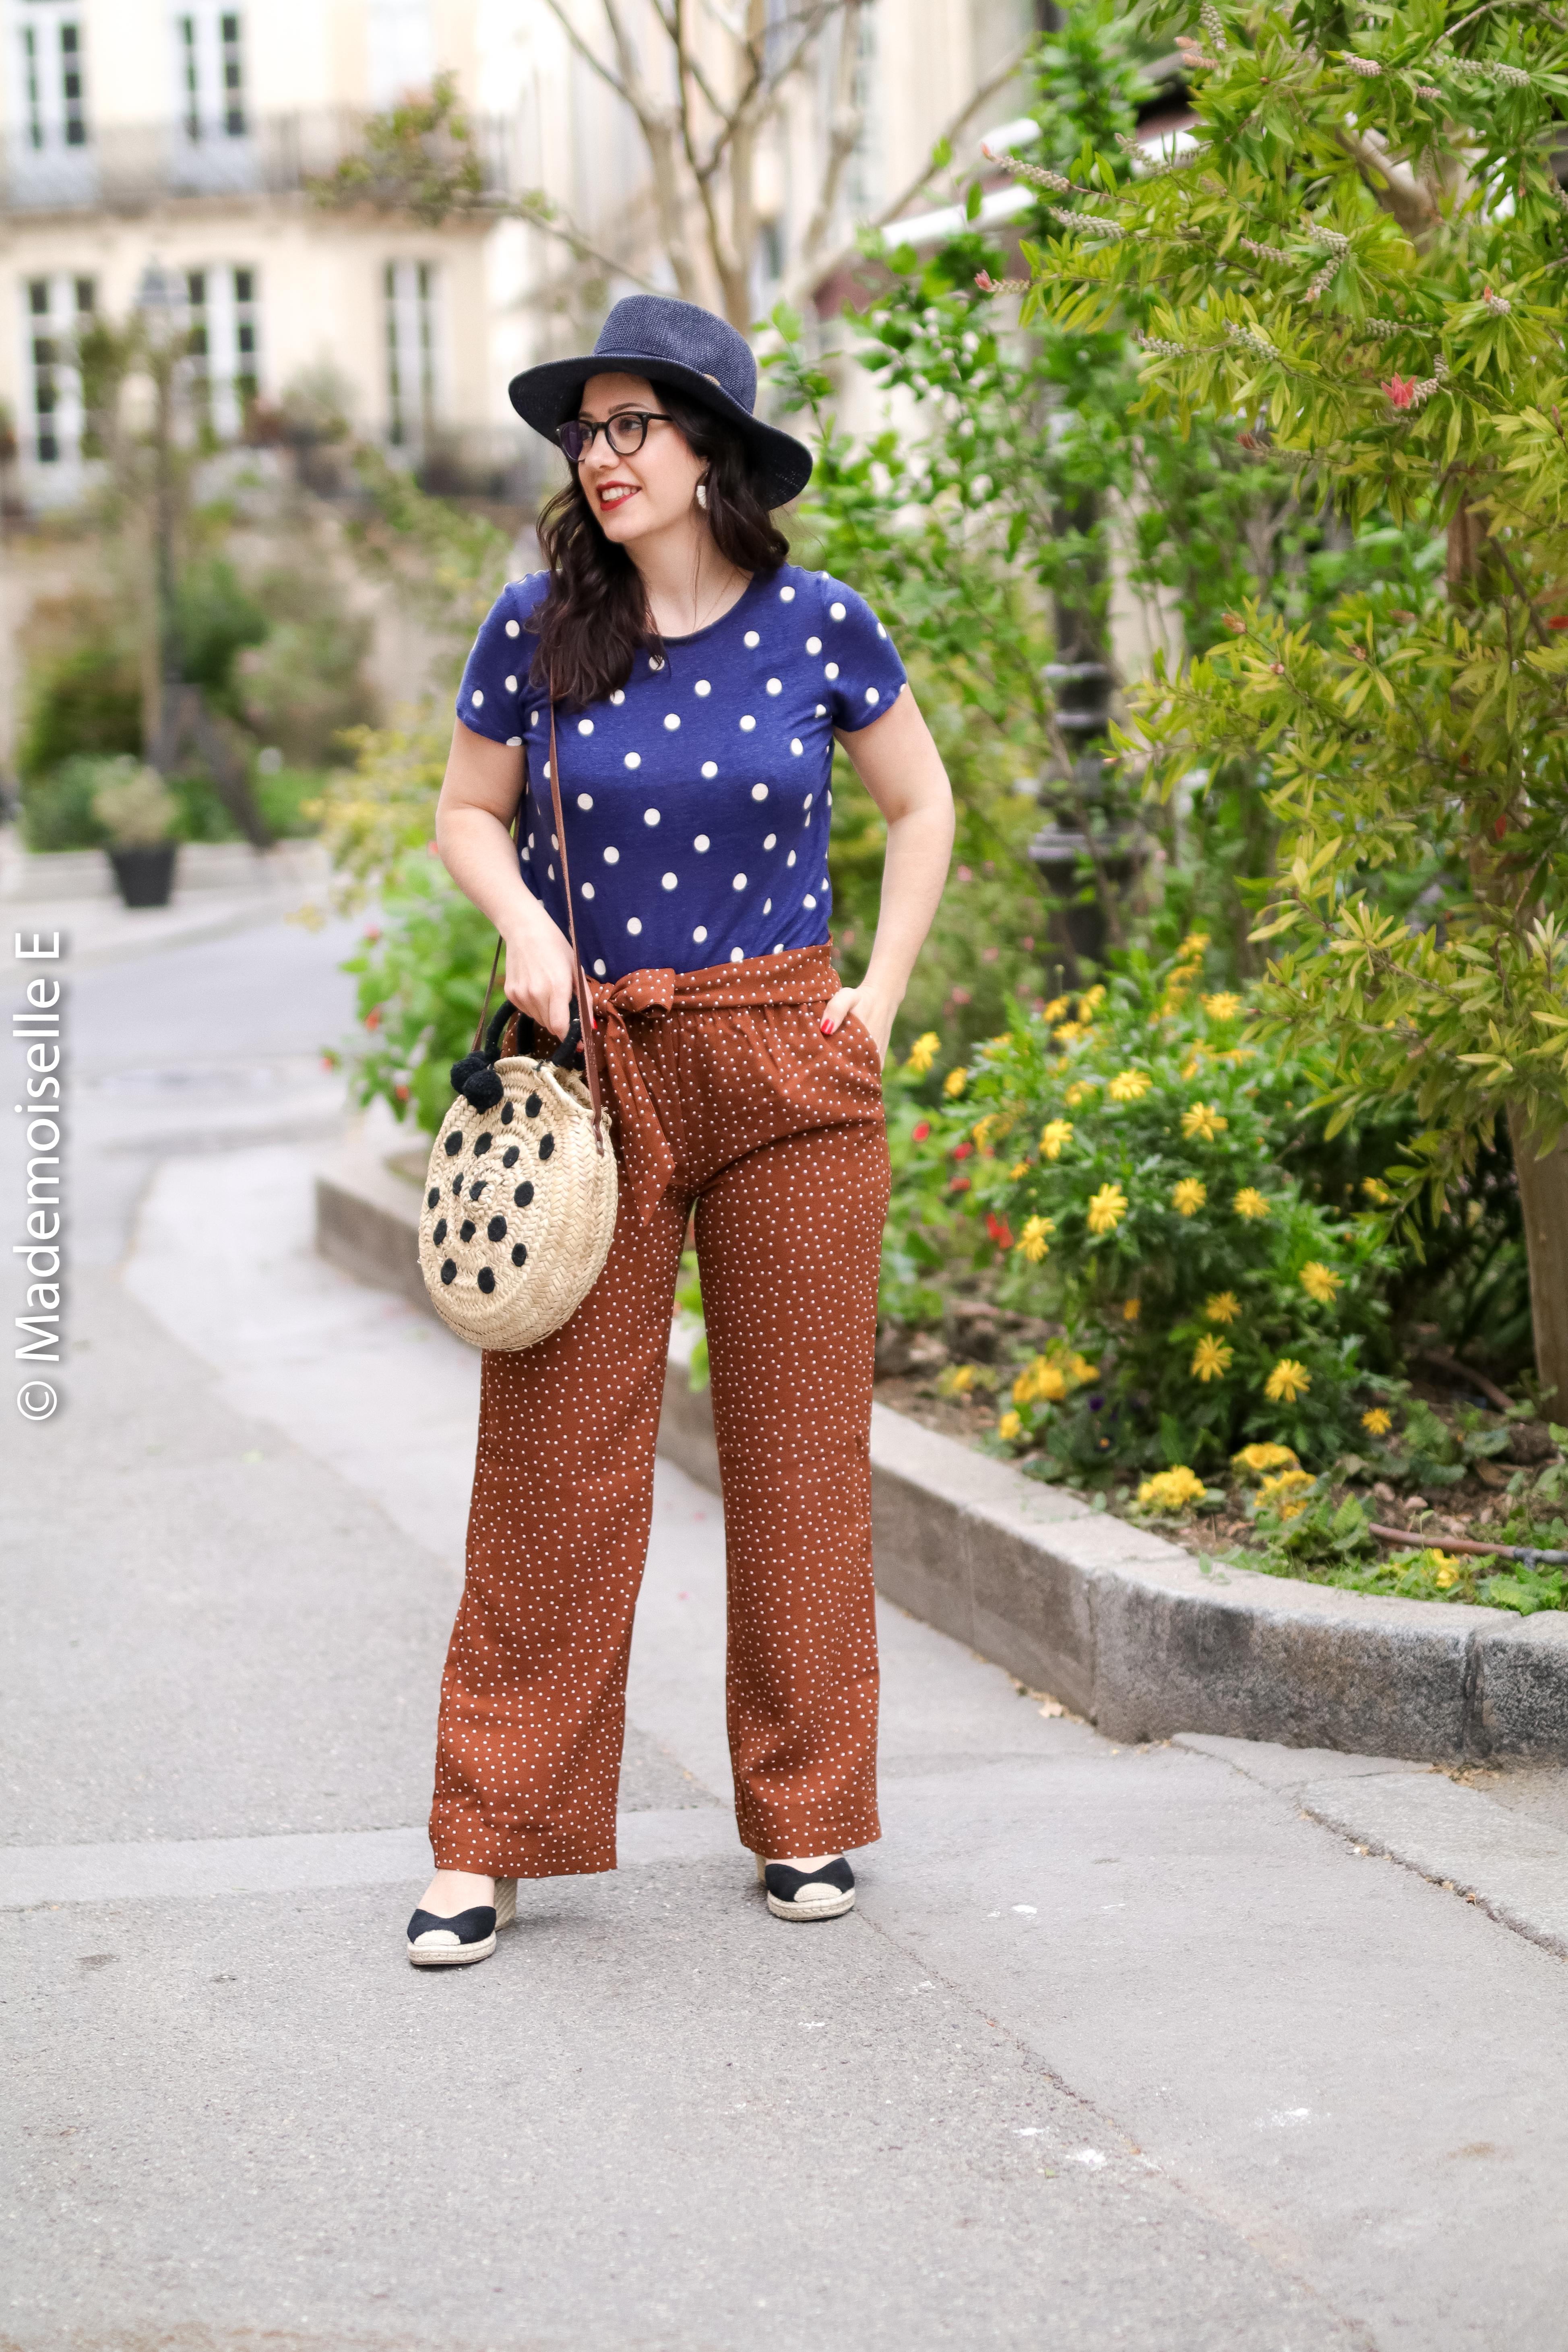 blog-mode-femme-total-look-a-pois-9-mademoiselle-e